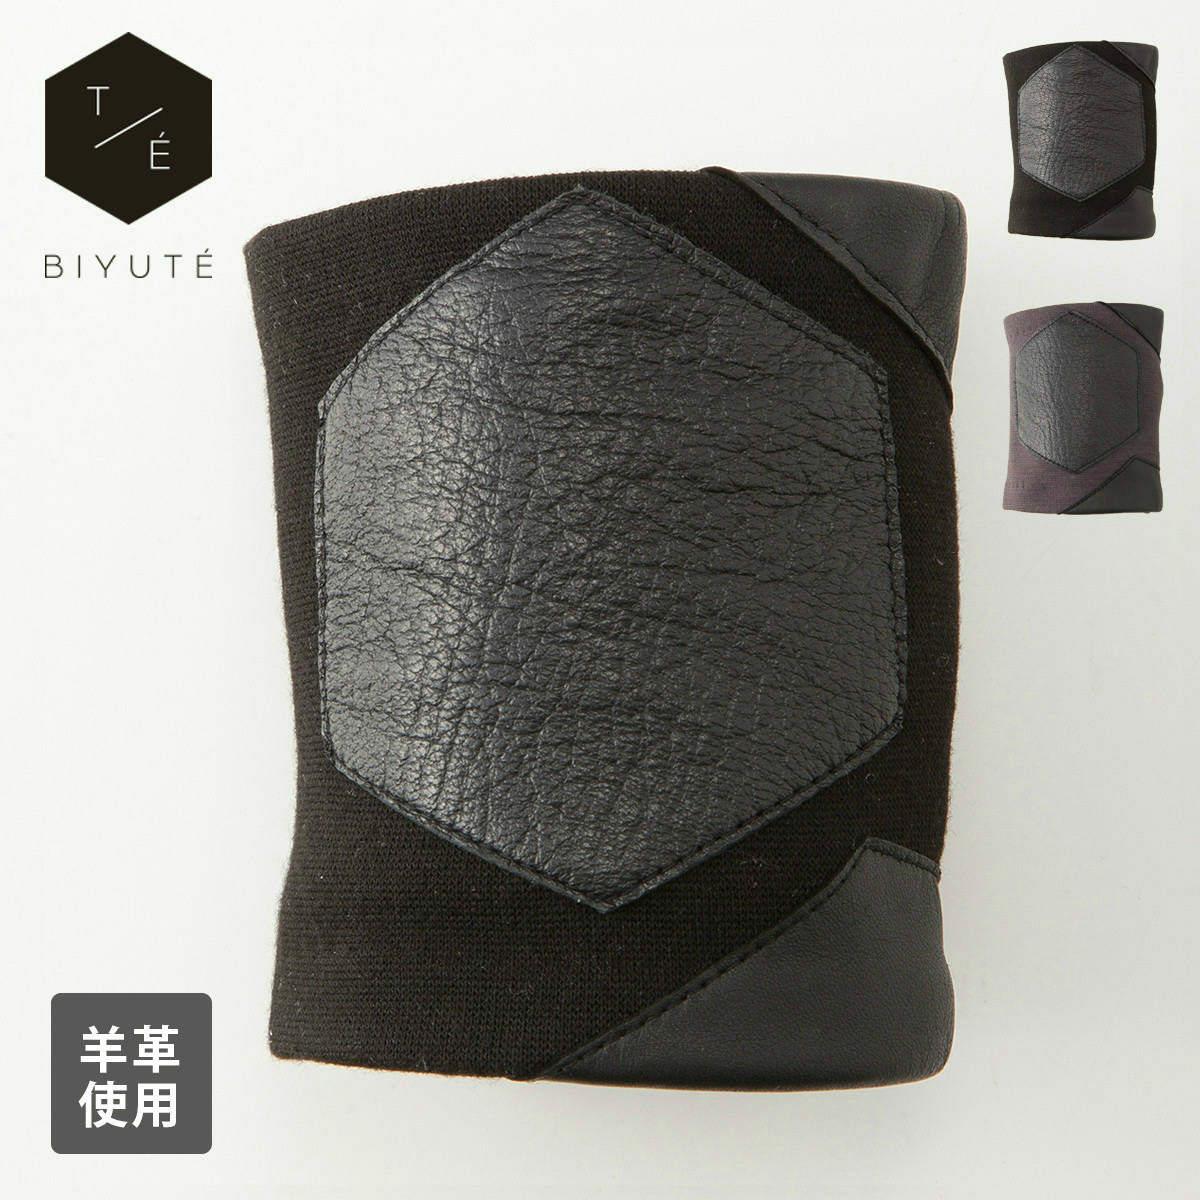 BIYUTE パームカフ ハンドアクセサリー ビユテ手袋に重ねつけ ヘキサゴン型レザーデザイン コーディネイト用 全2色